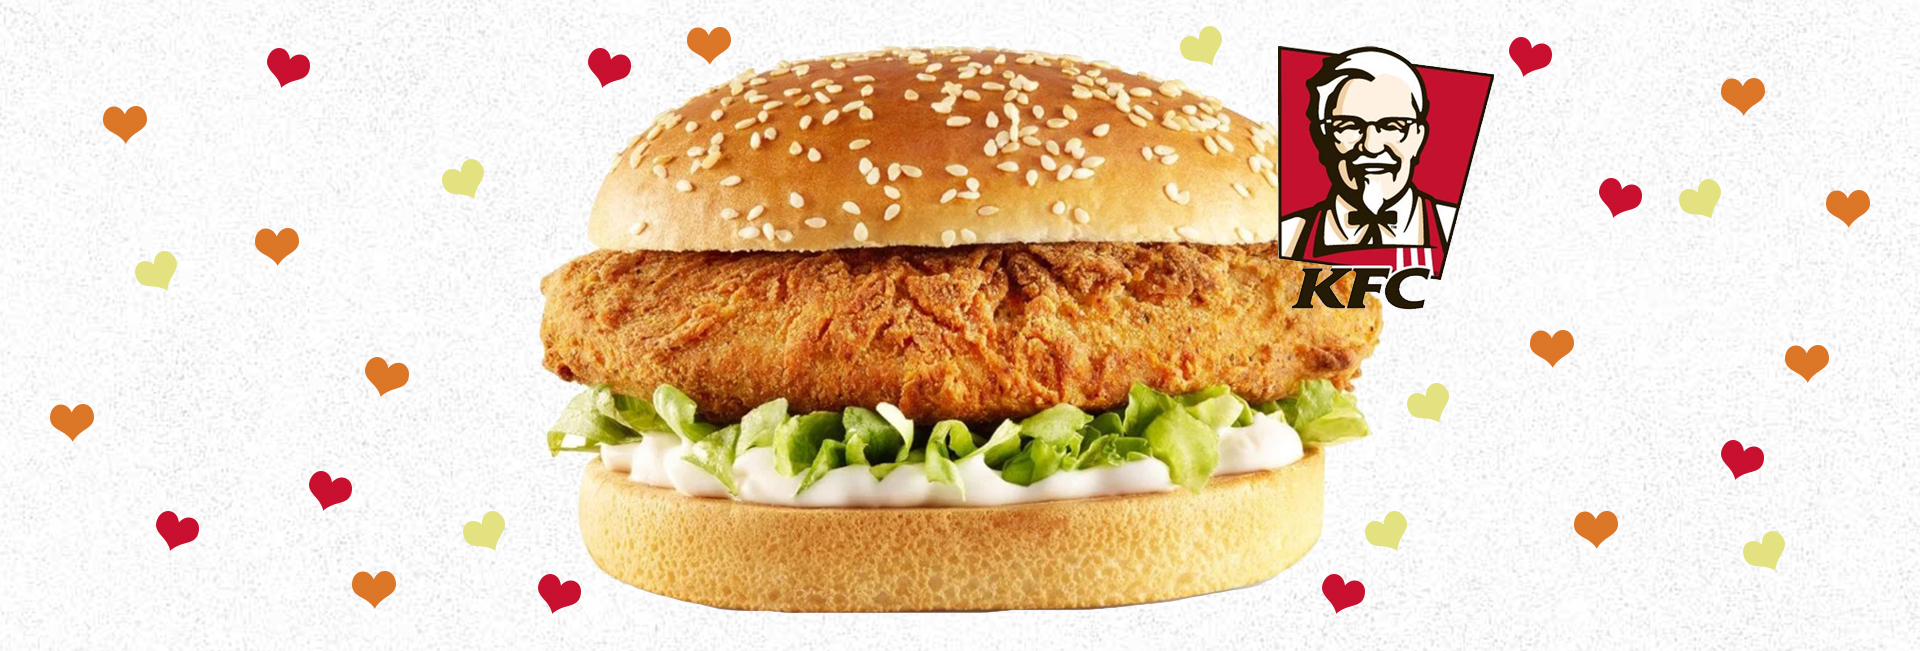 vegan kfc imposter burger